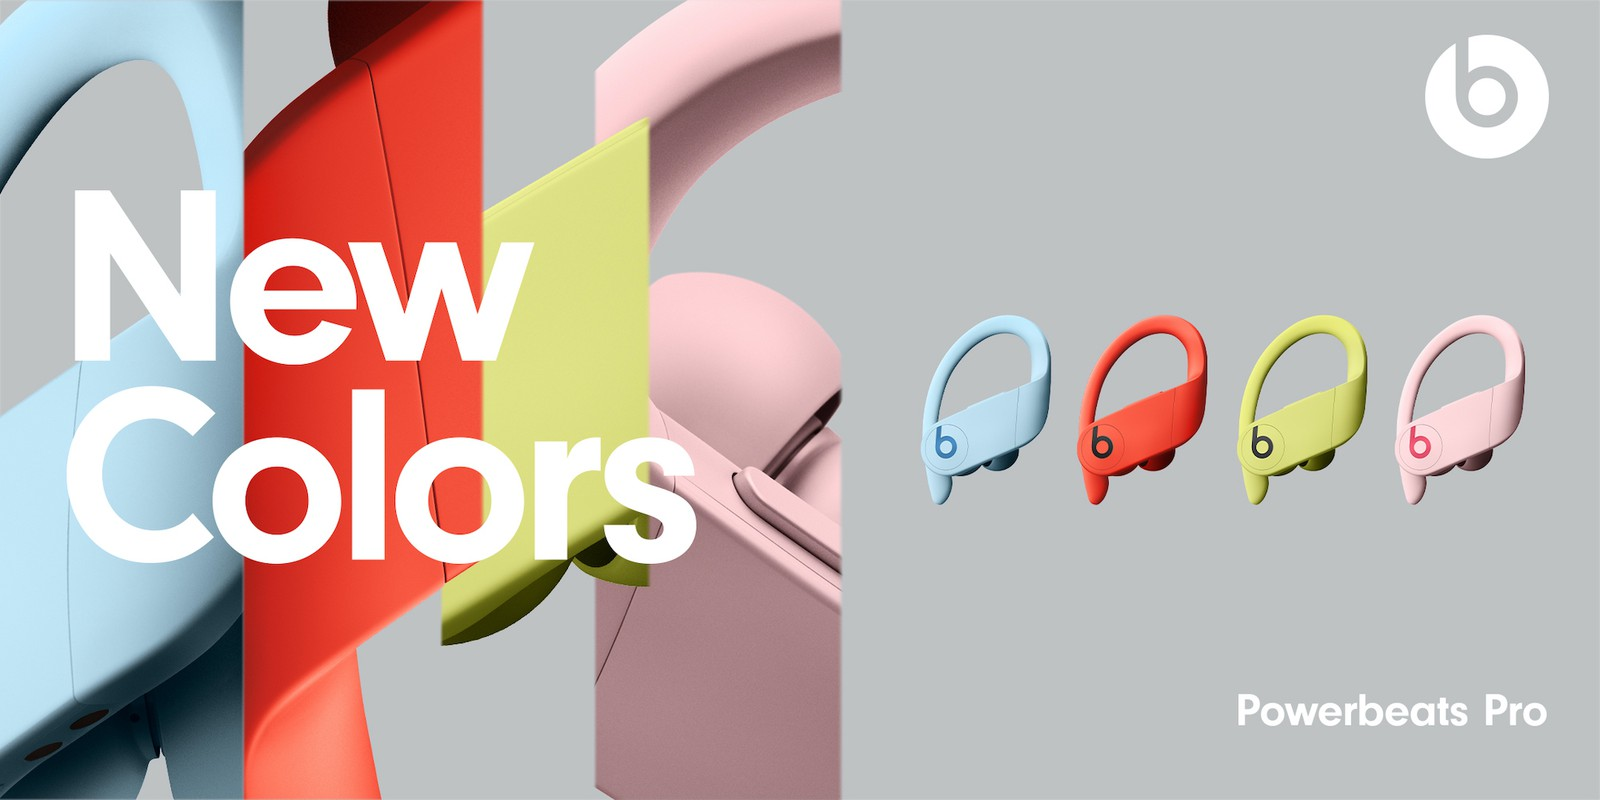 Powerbeats Proに爽やかな新色登場。日本で10日発売